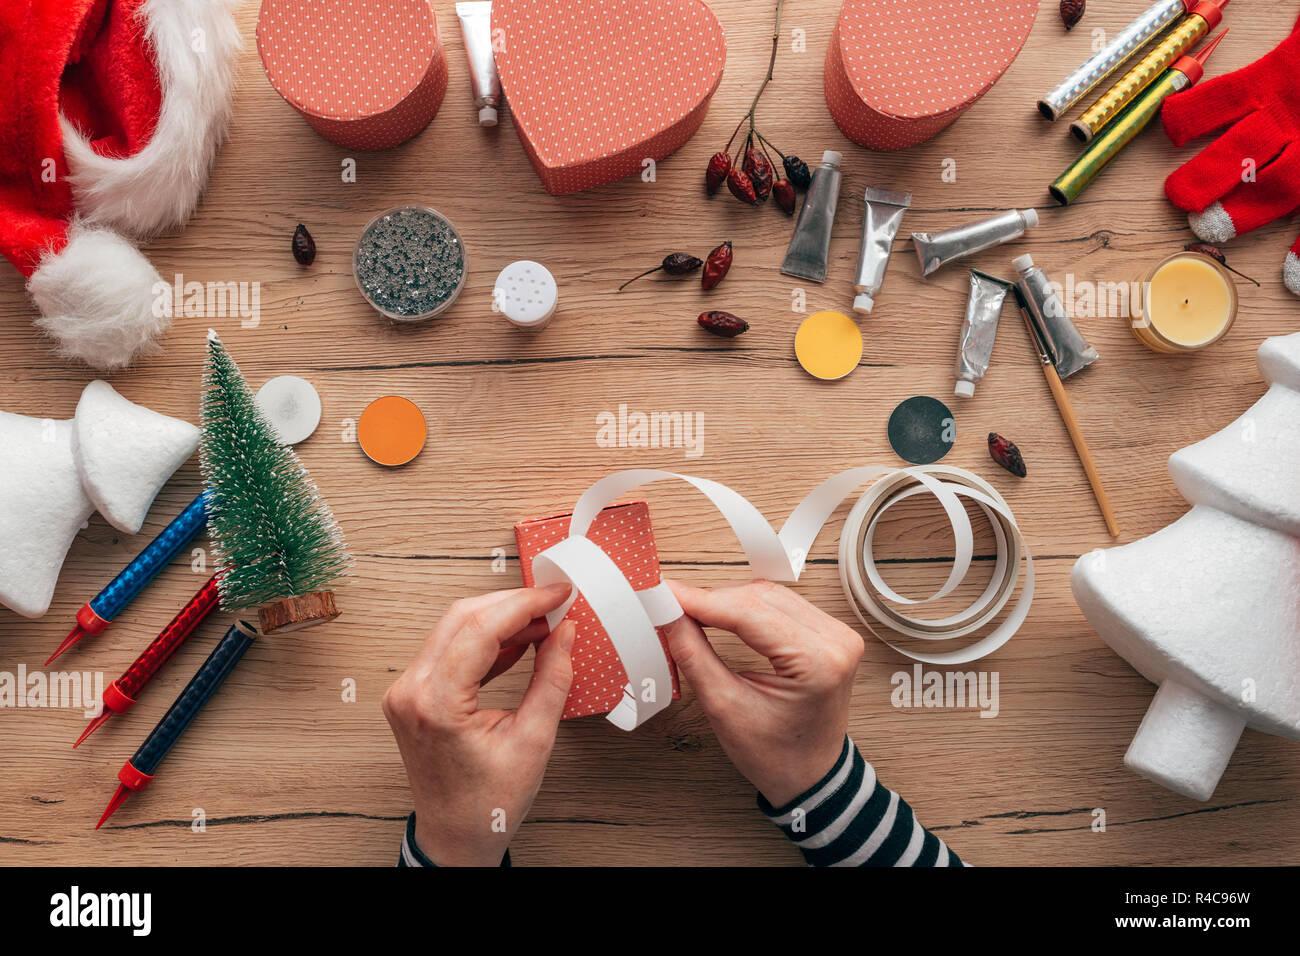 Creative Diy Craft Hobby Woman Making Christmas Gift Presents Top